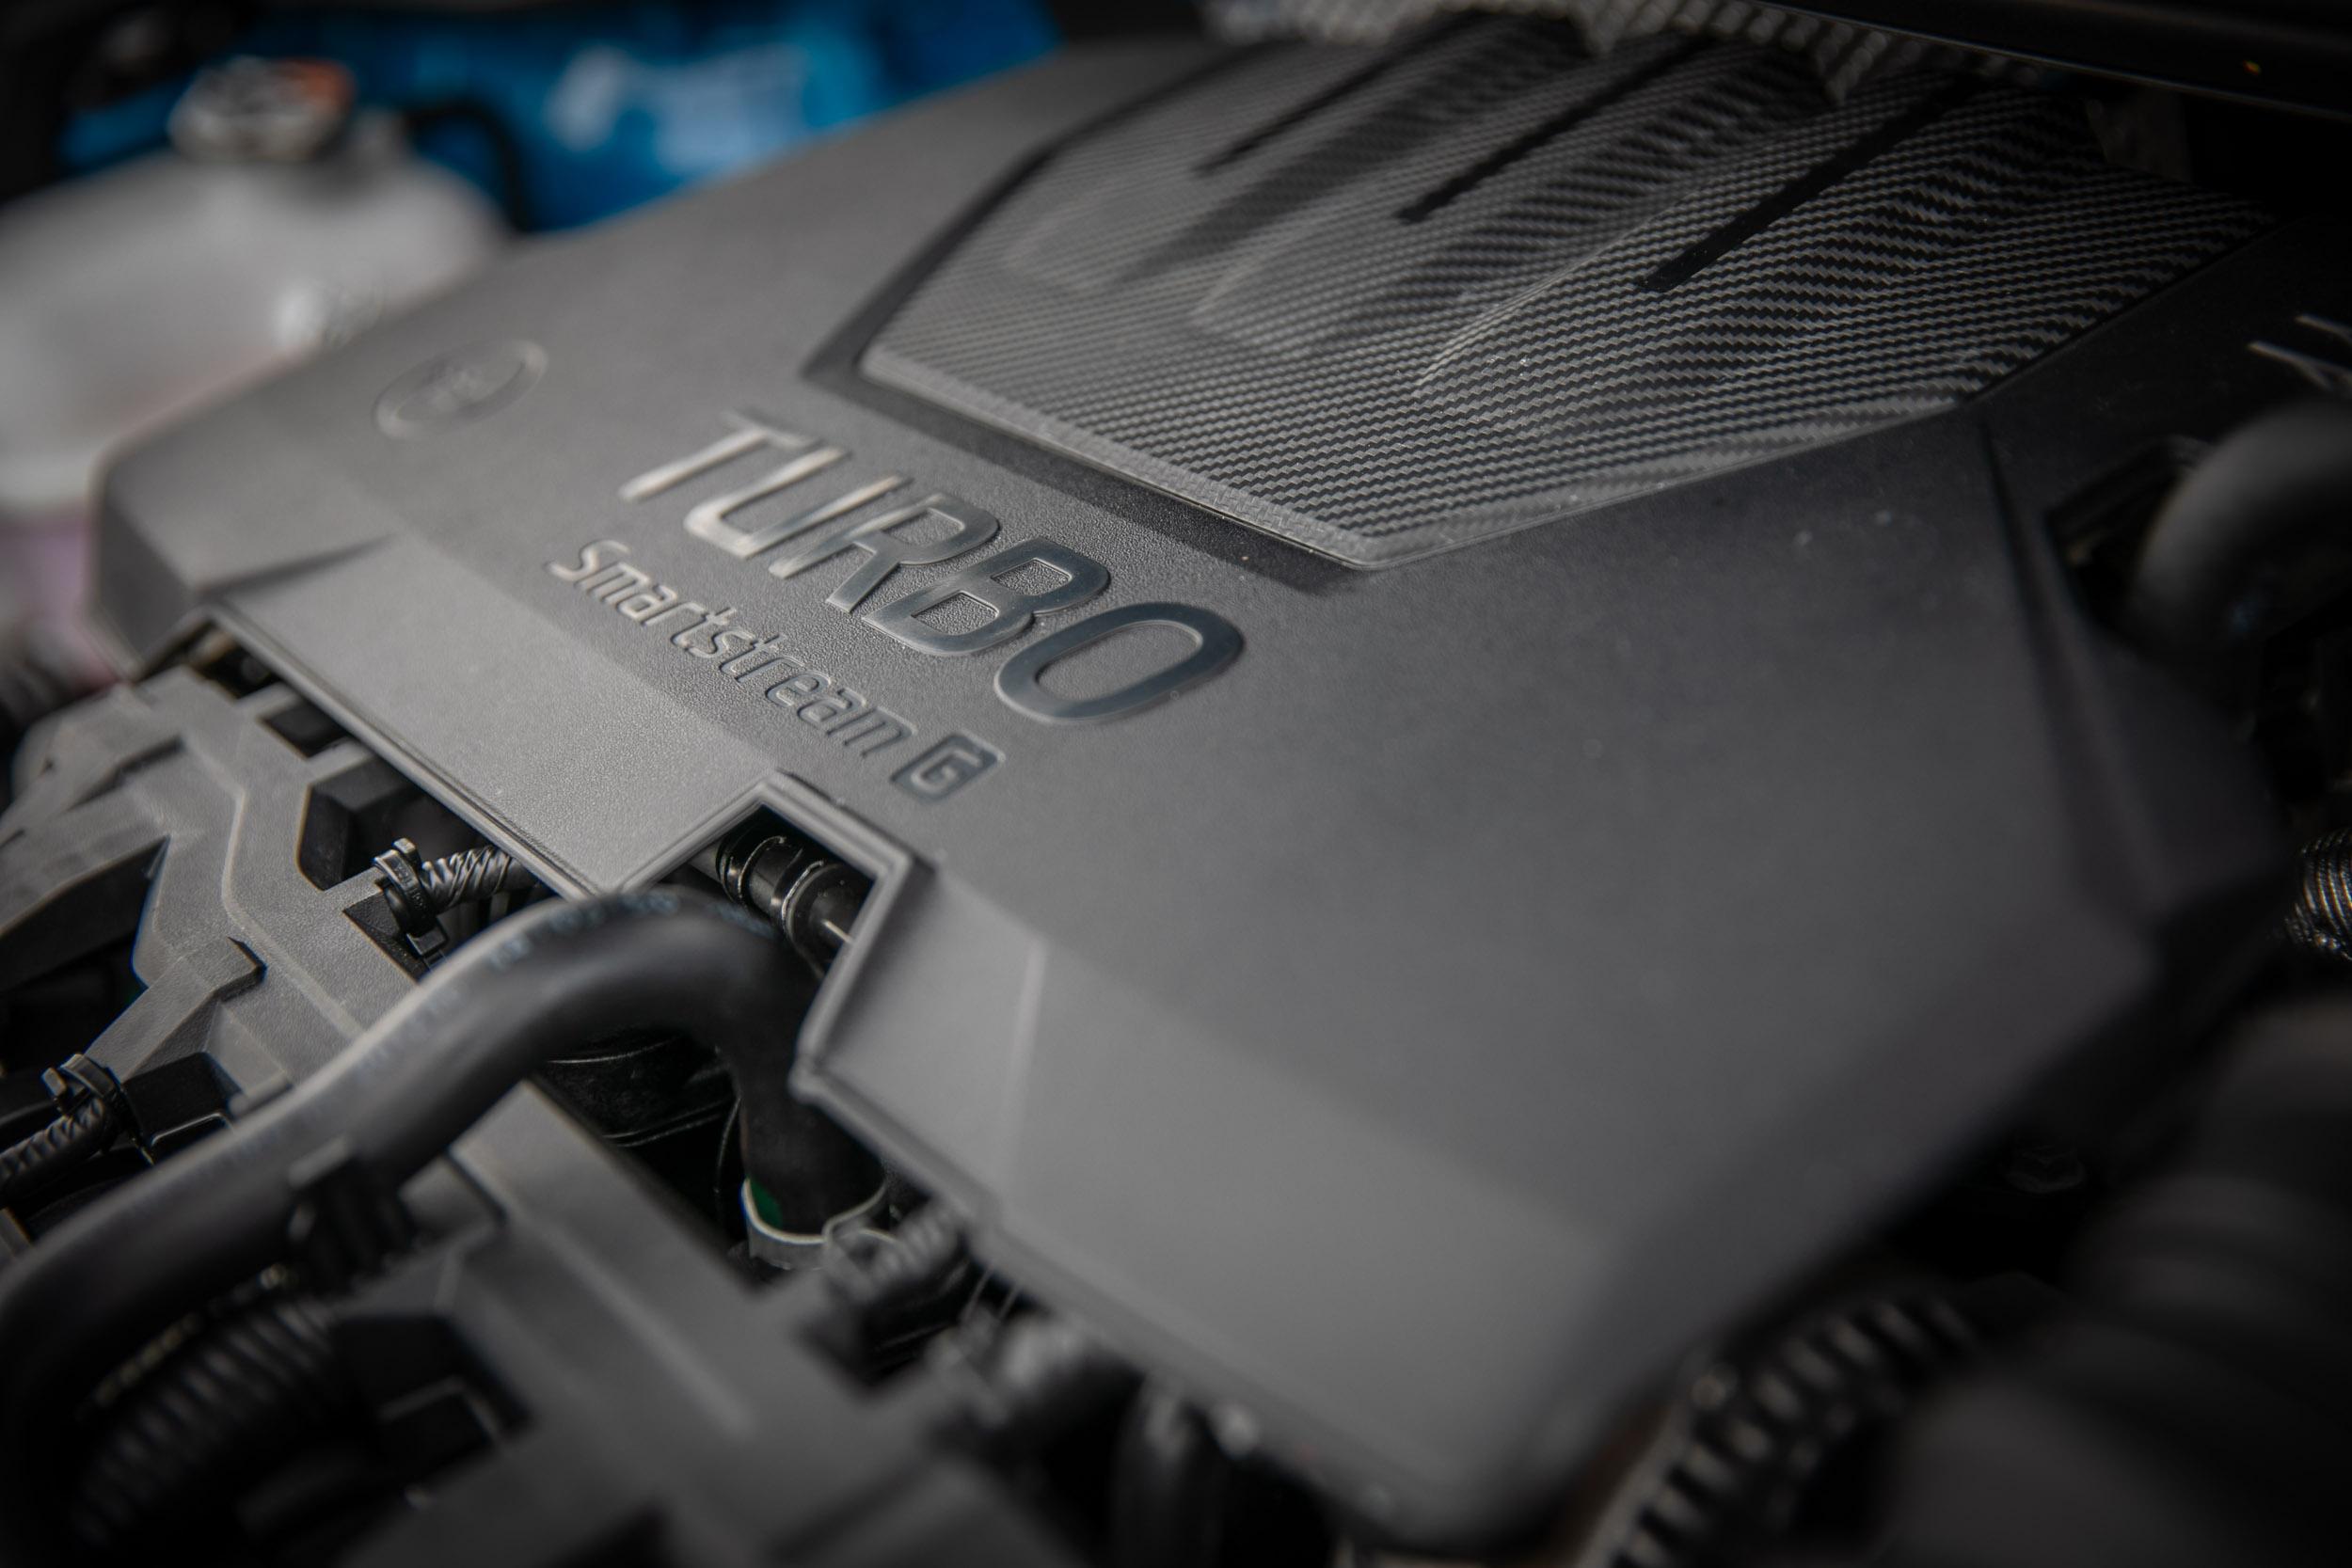 Stonic 1.0T智慧油電驚豔版搭載 1.0 升渦輪增壓直列三缸汽油引擎,具備 120ps/6000rpm 最大馬力與 20.4kgm/2000~3500rpm 最大扭力輸出。